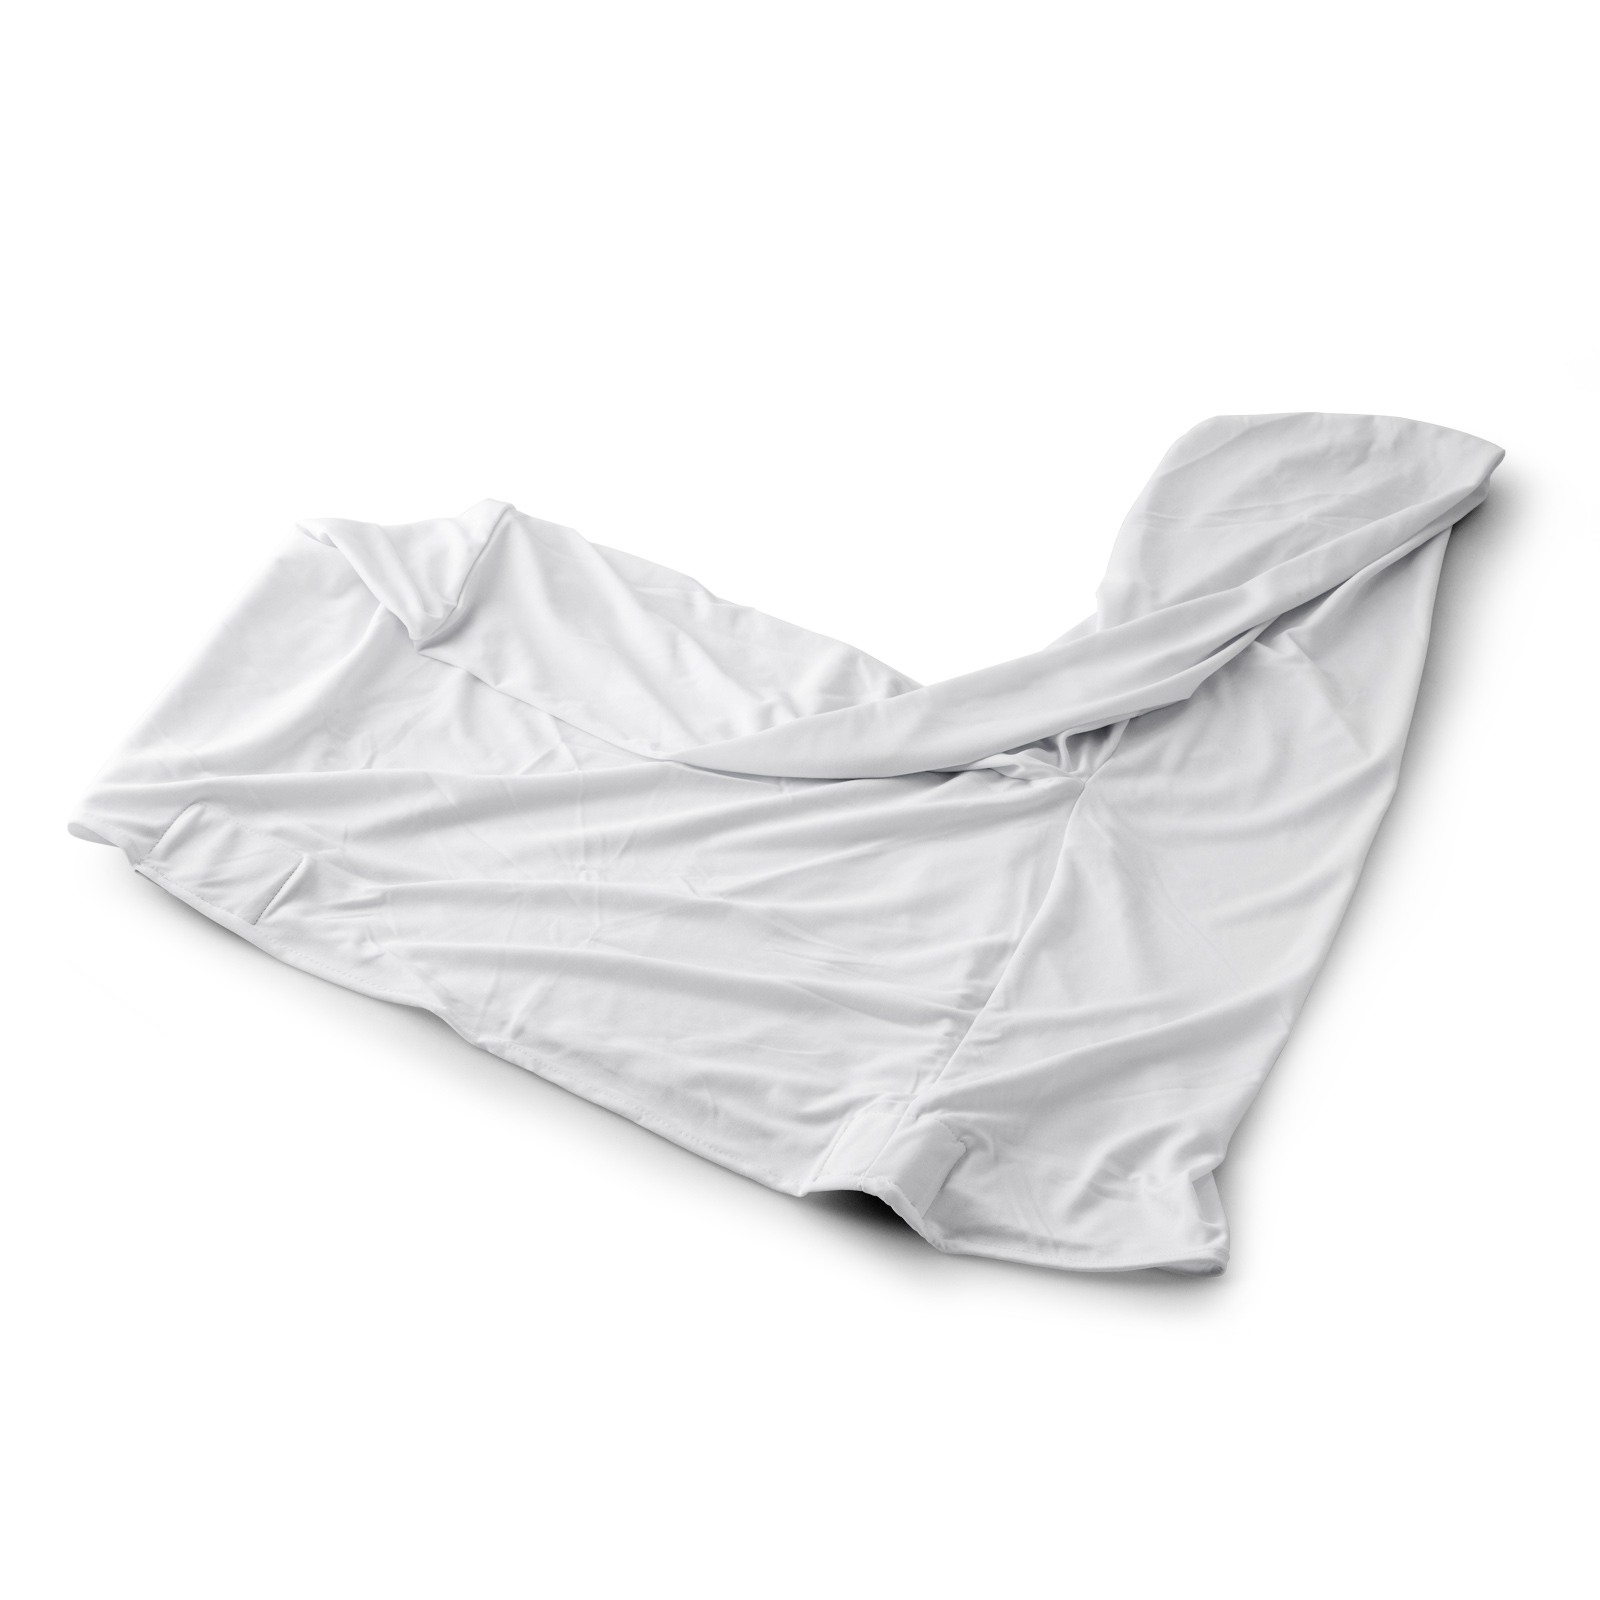 100pcs Stretch Spandex White Folding Chair Covers Seat